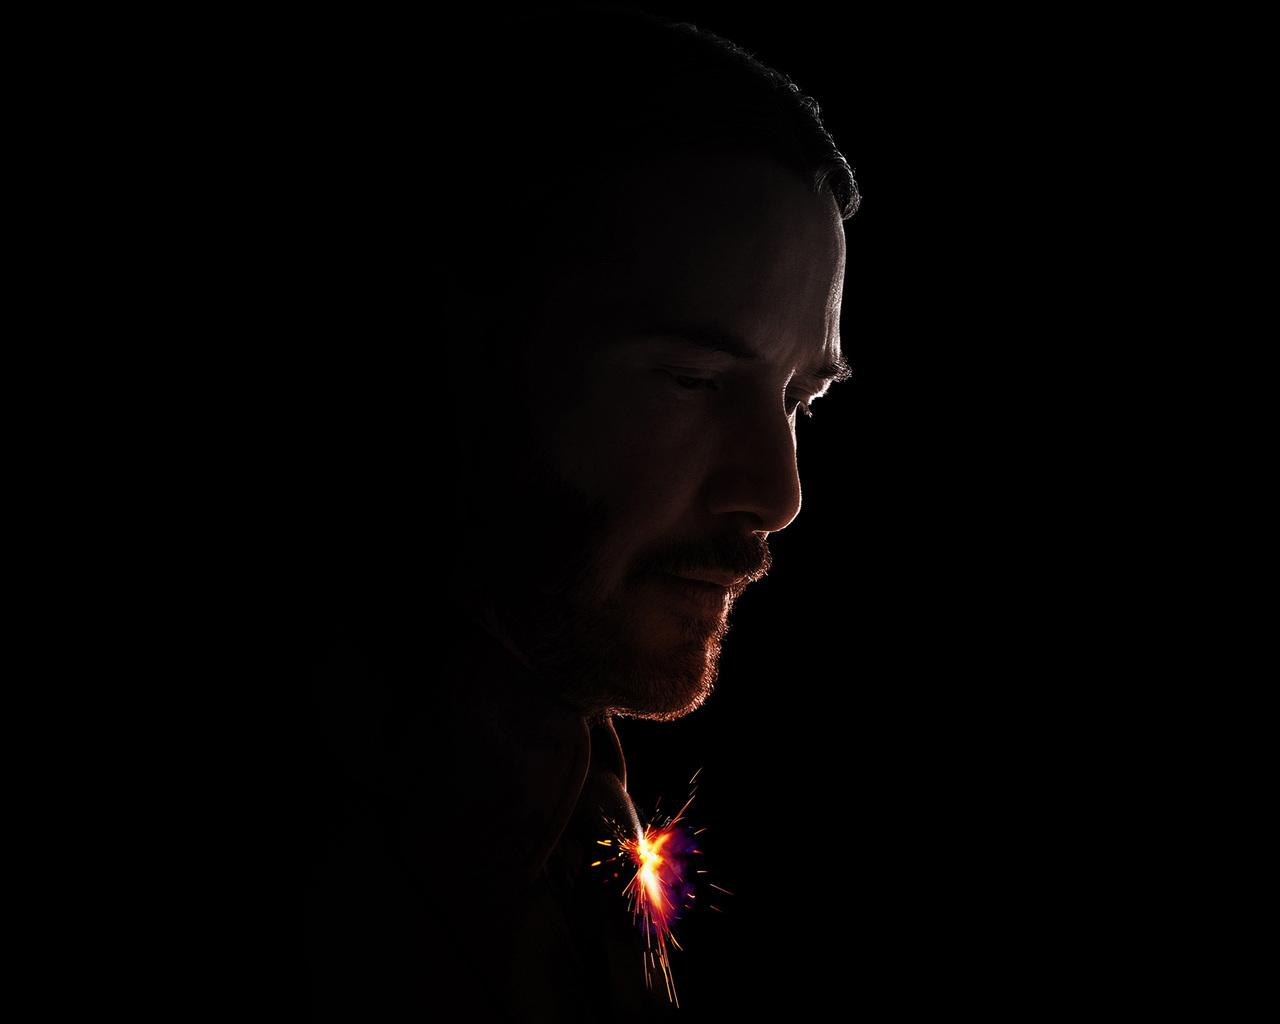 john-wick-chapter-2-2017-ad.jpg